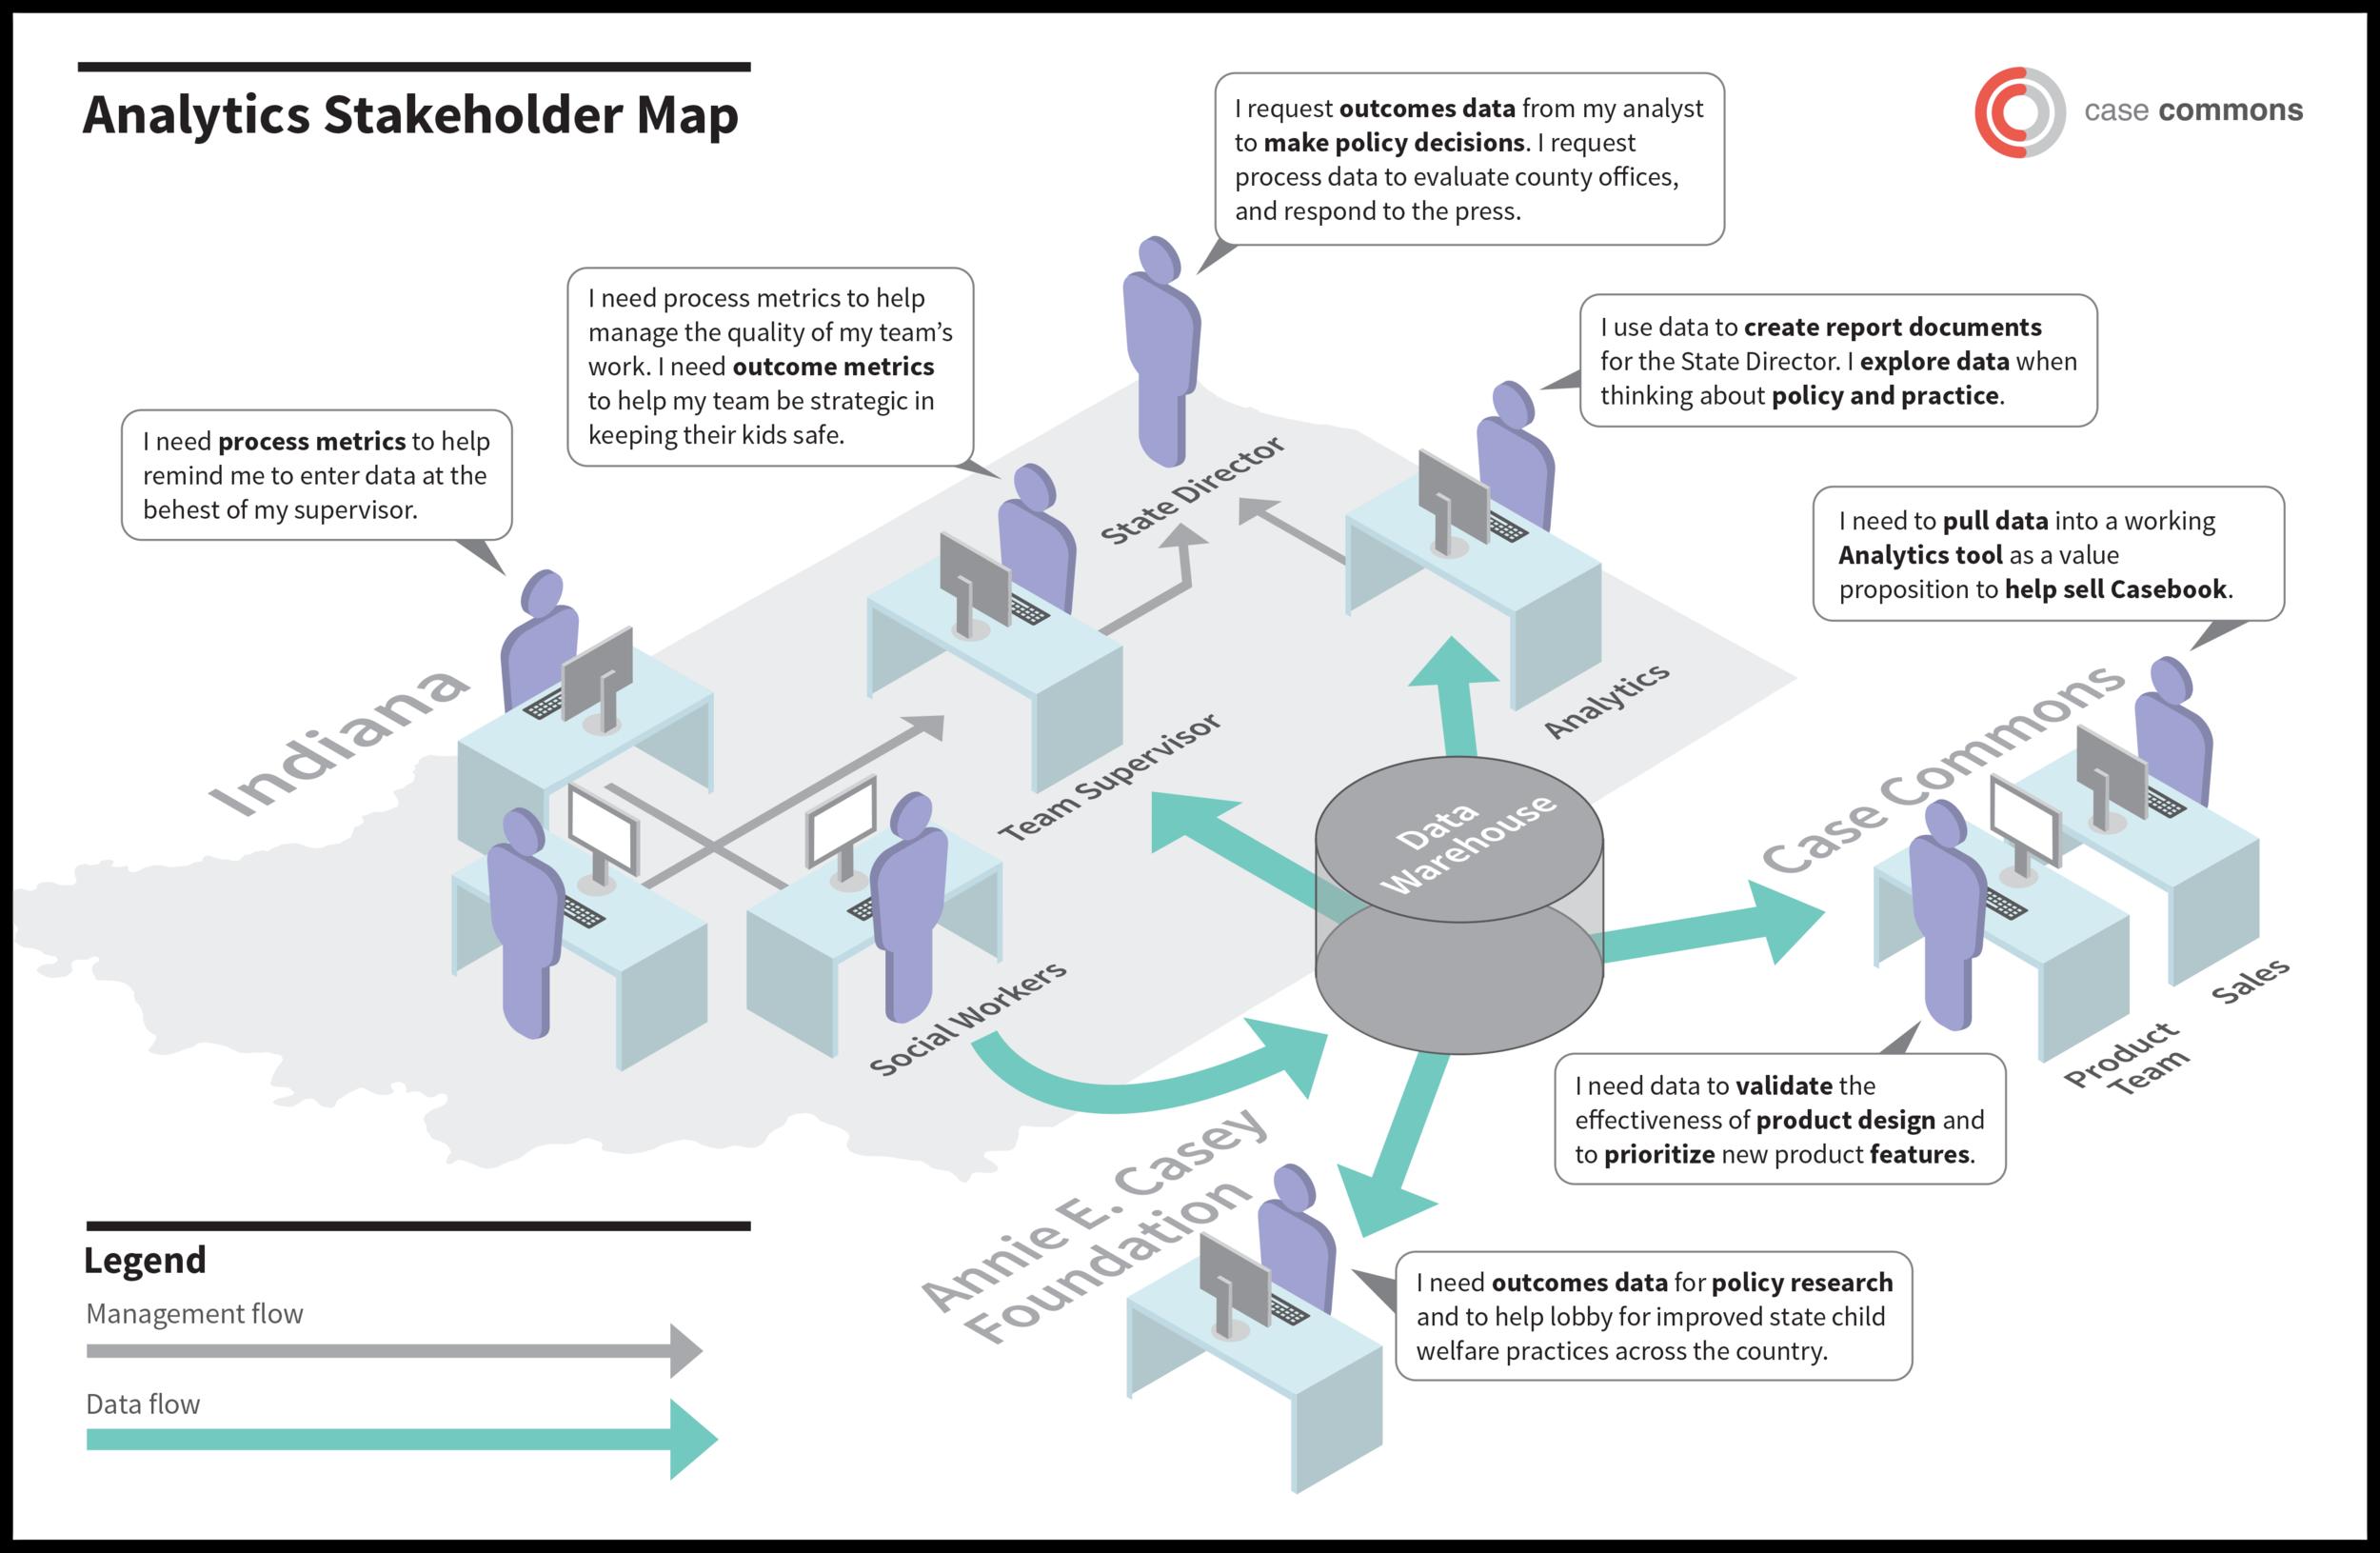 Analytics Stakeholder Map